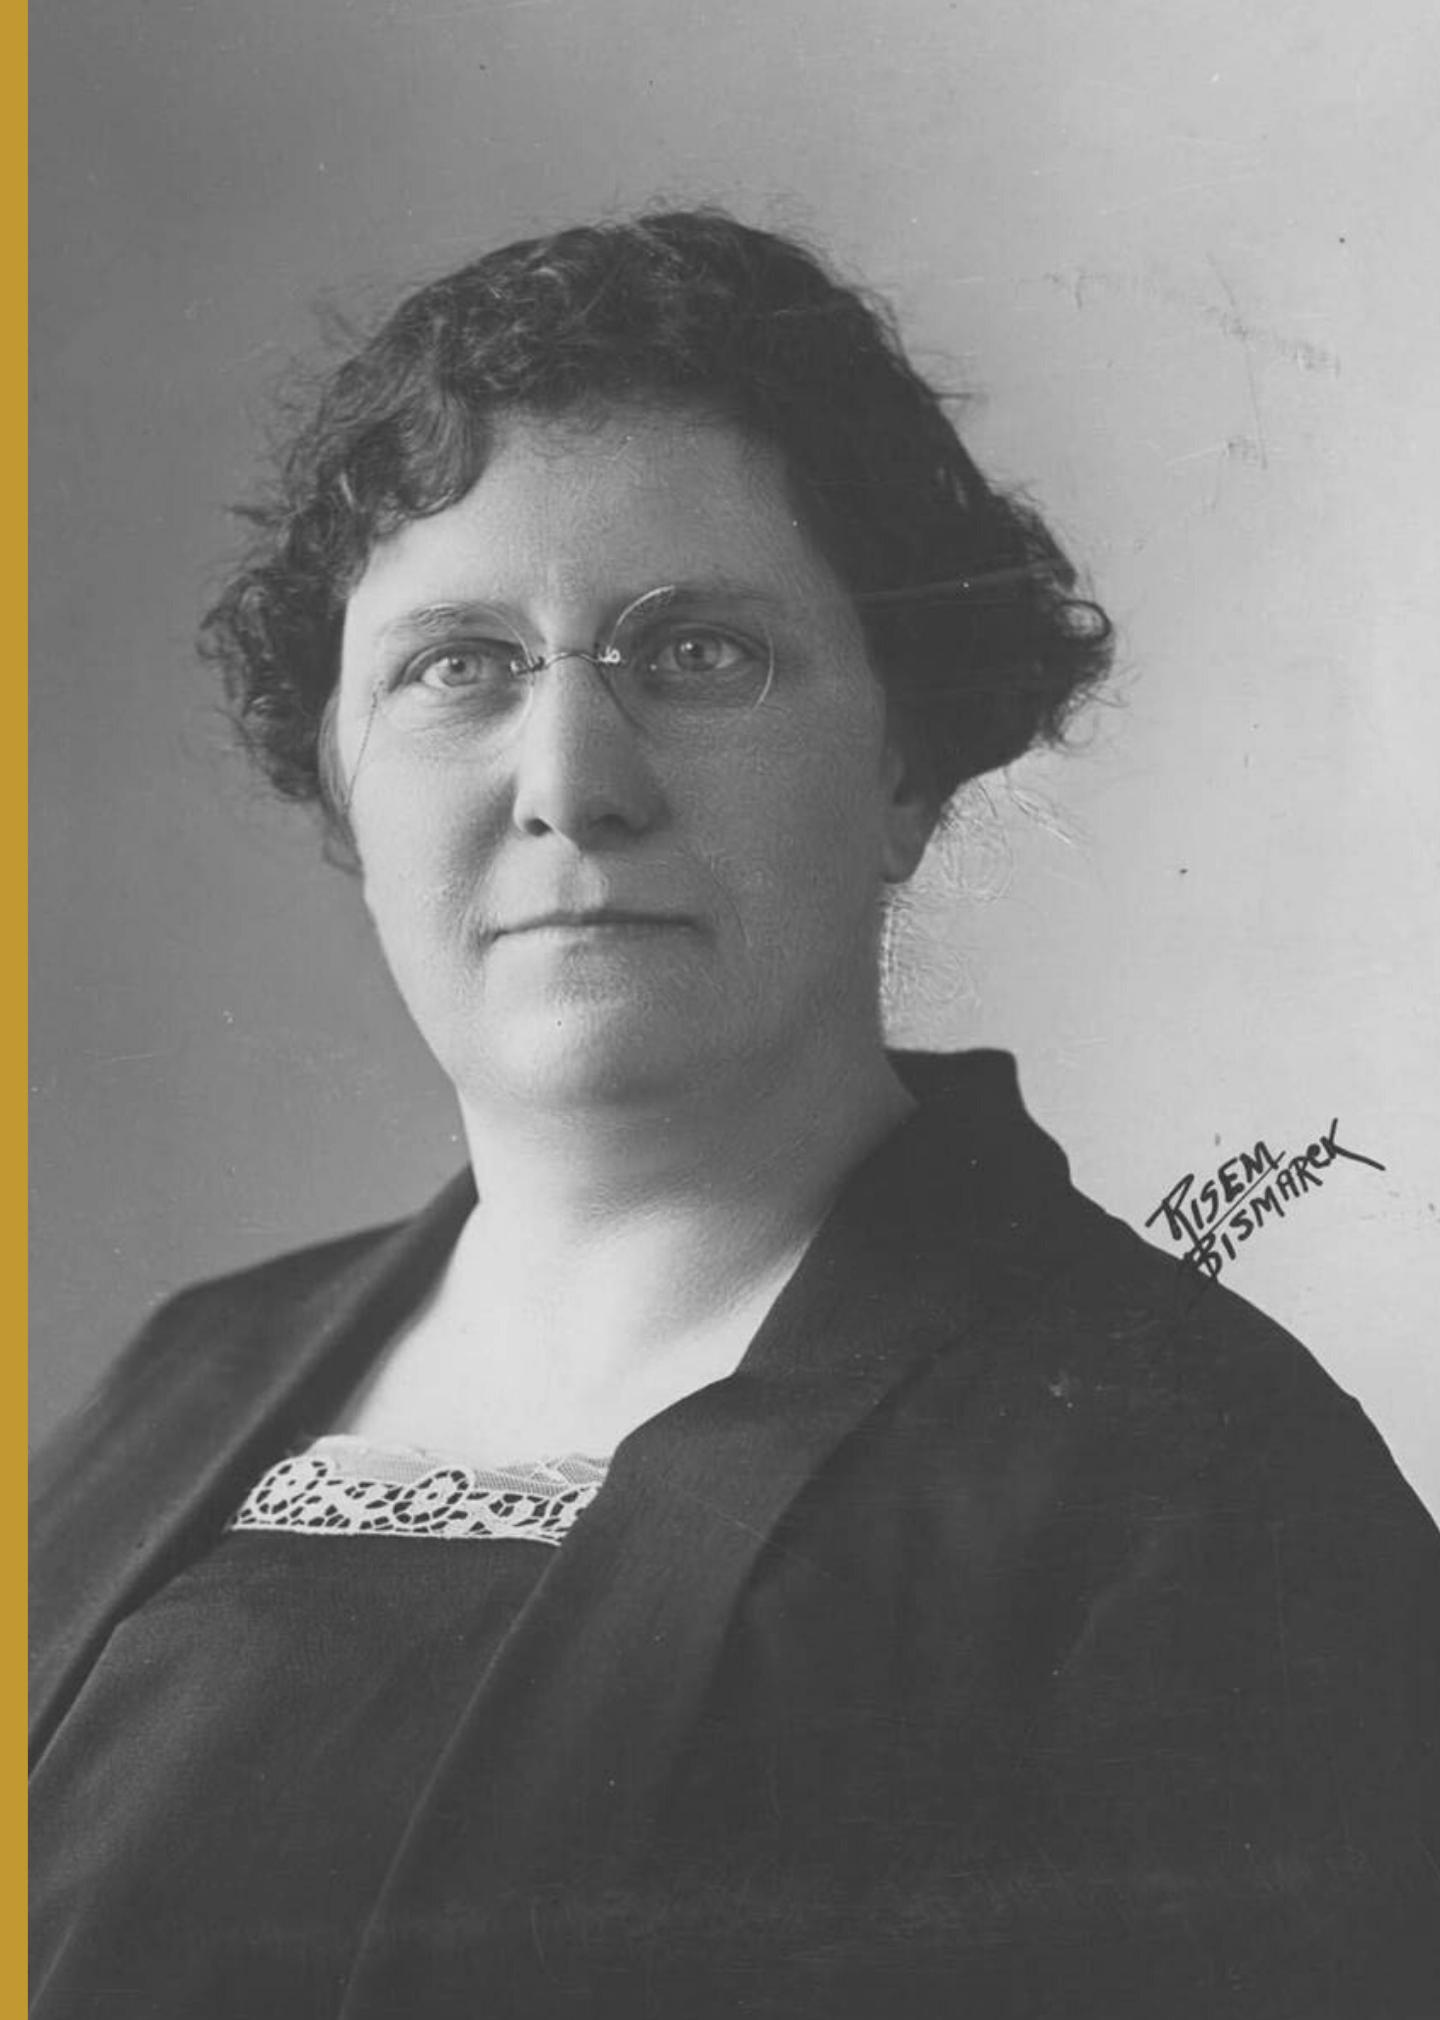 Minnie Craig (Nov. 4, 1883 - July 2, 1966)